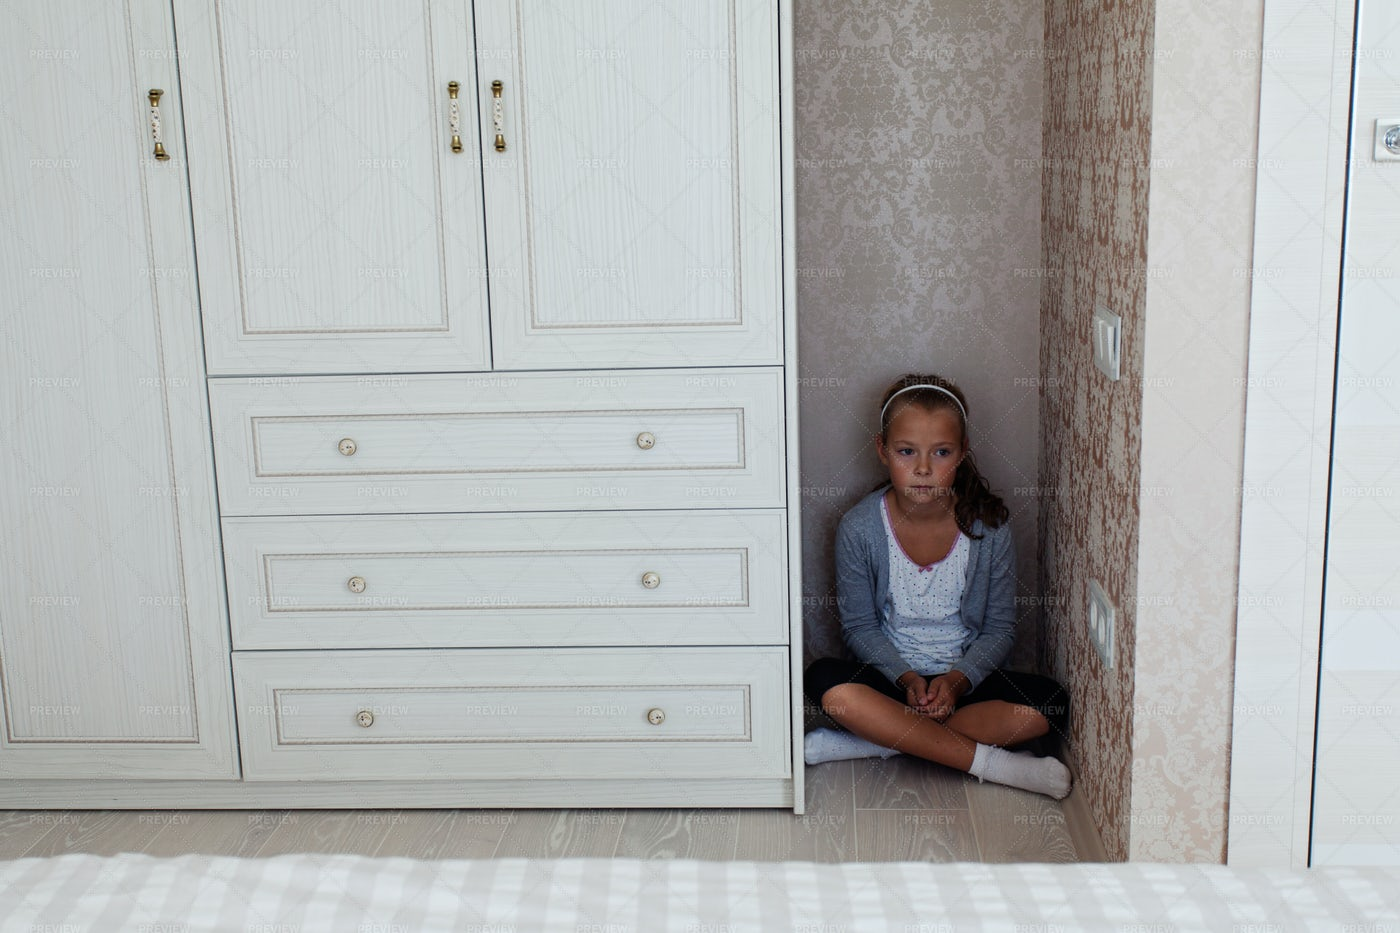 Sad Girl Sitting On Floor: Stock Photos